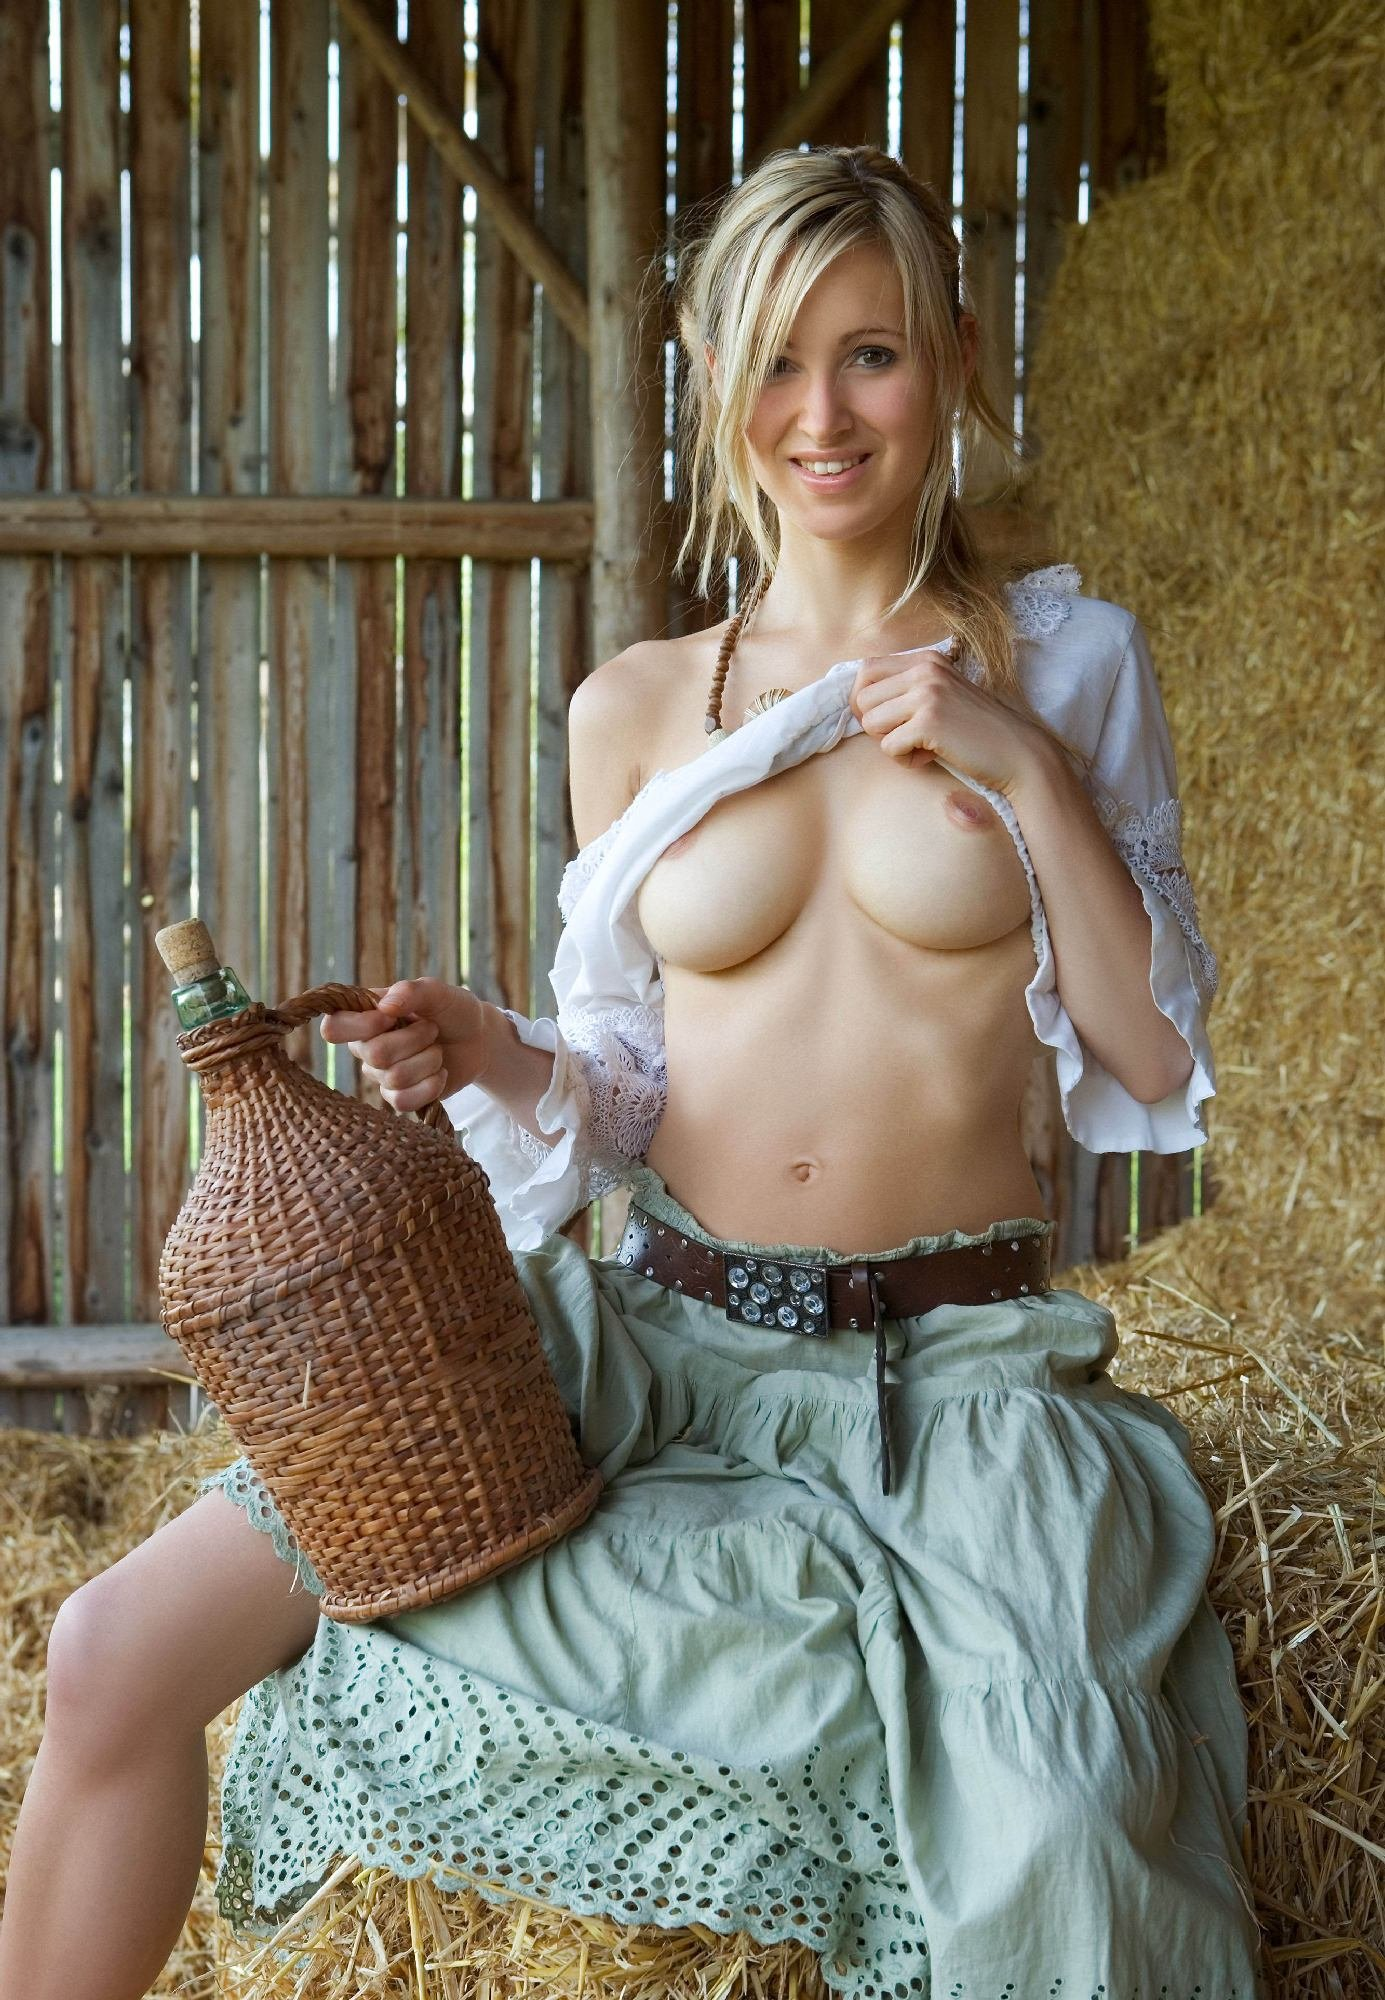 Эротика фото крестьянка — 1